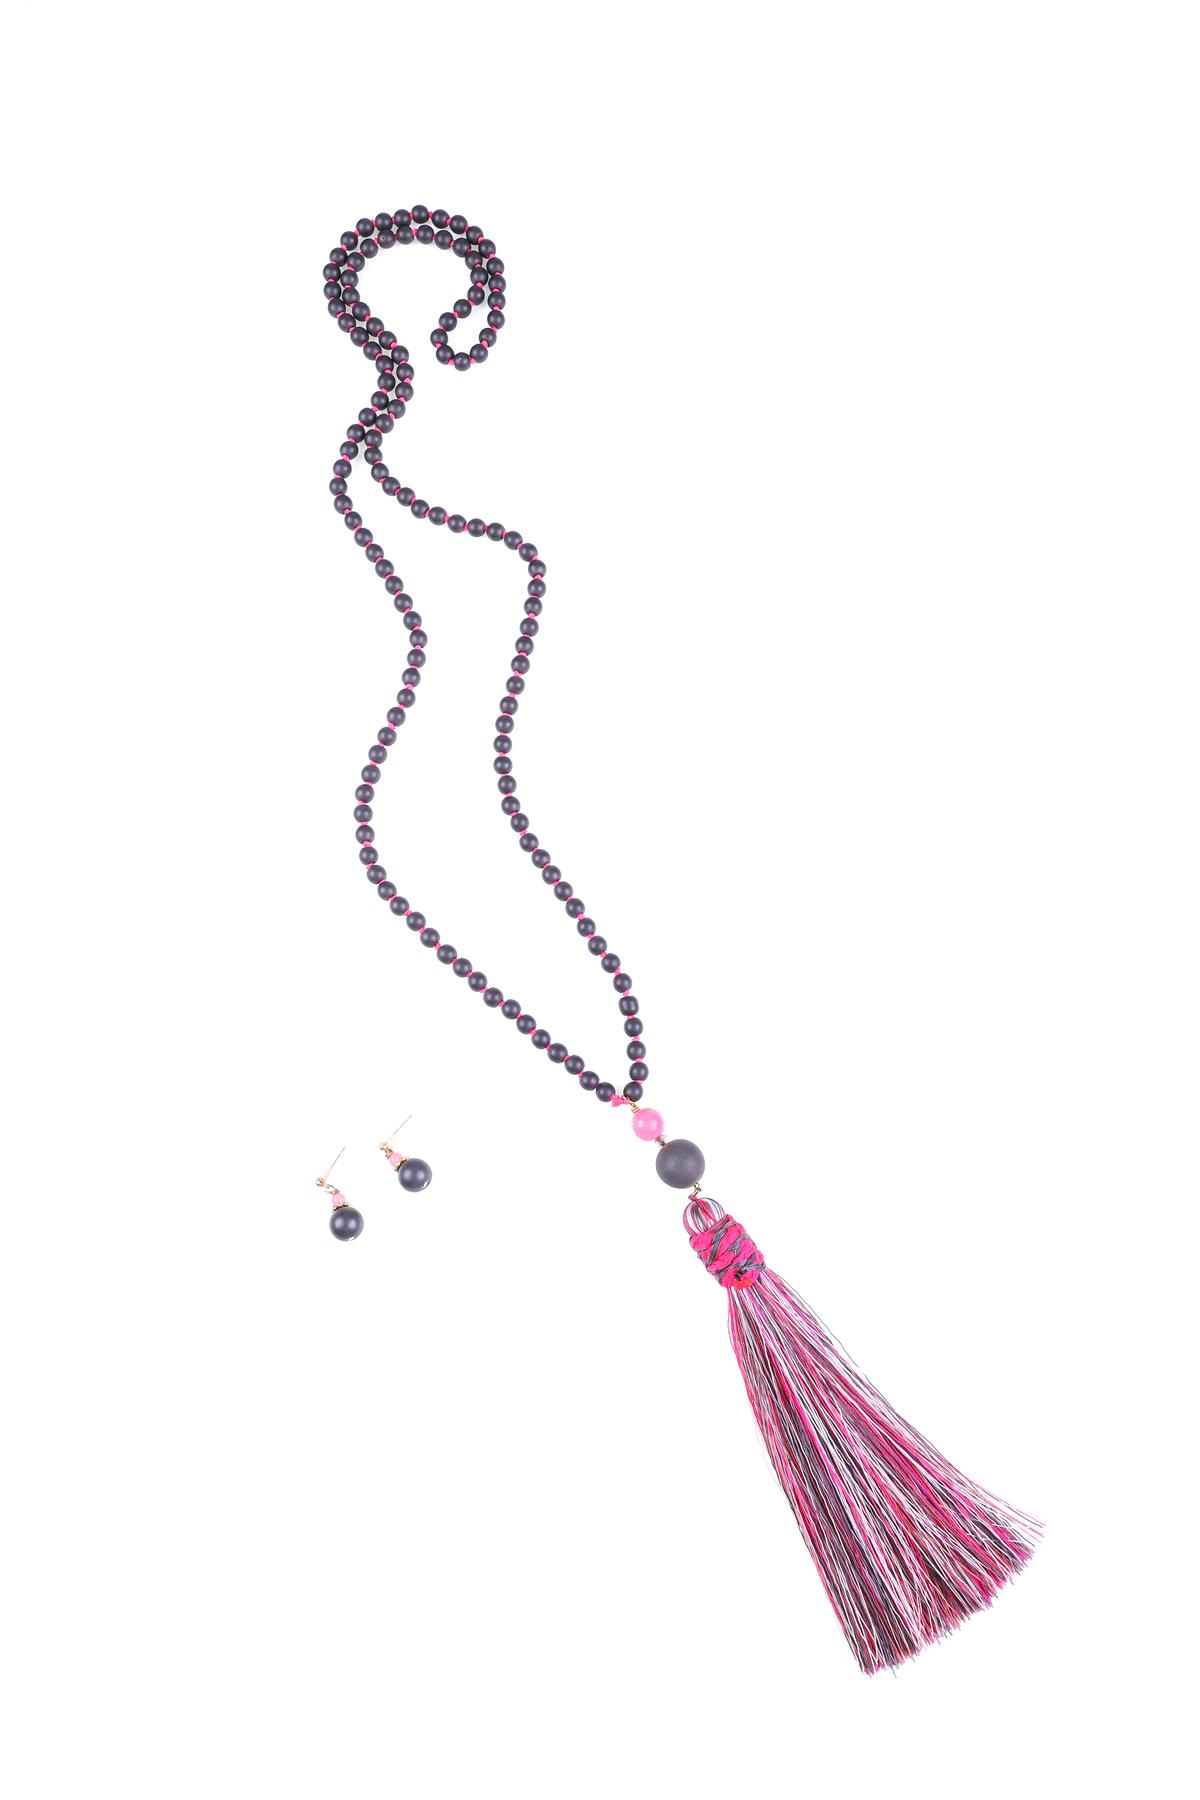 boho-neon-A240_B-osaya-joyas-artesanales-mexico